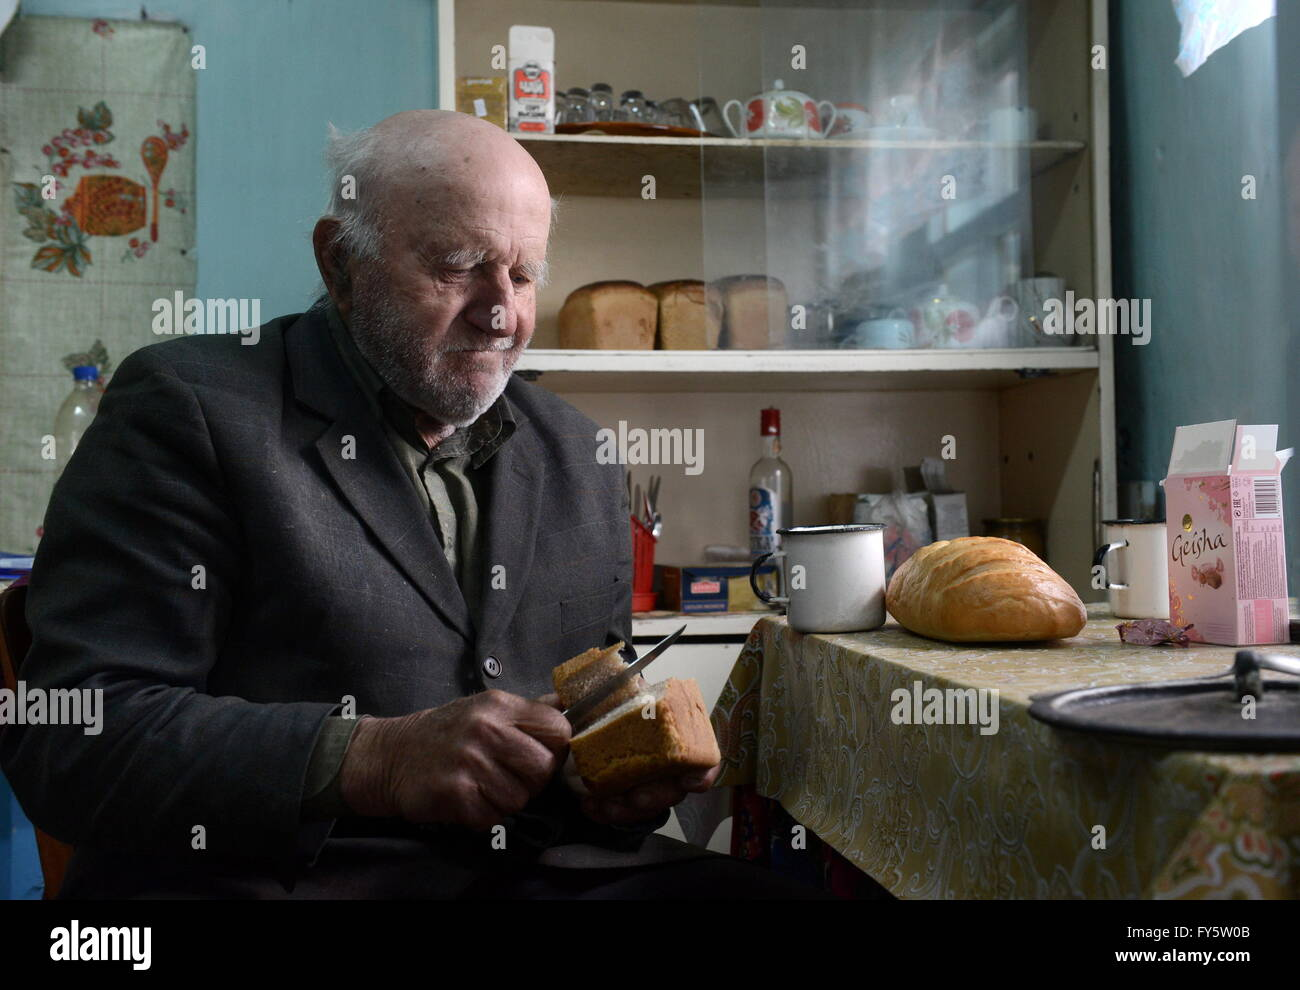 Gomel Region, Belarus. 22nd Apr, 2016. Ivan Shamyanok in his house in the village of Tulgovichi, Khoiniksky District, - Stock Image